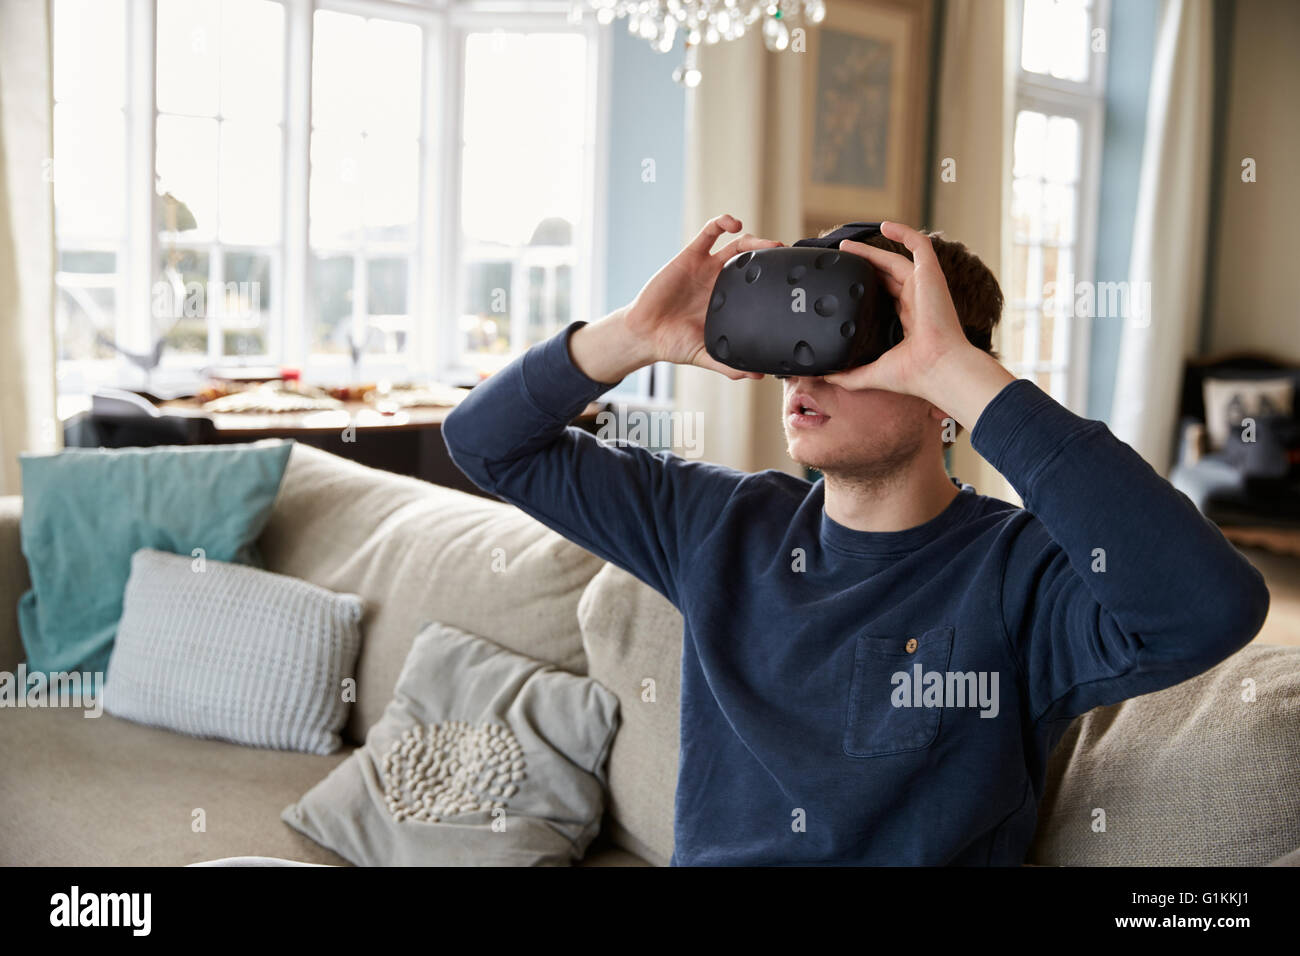 Young Woman Wearing Virtual Reality Headset In Studio - Stock Image